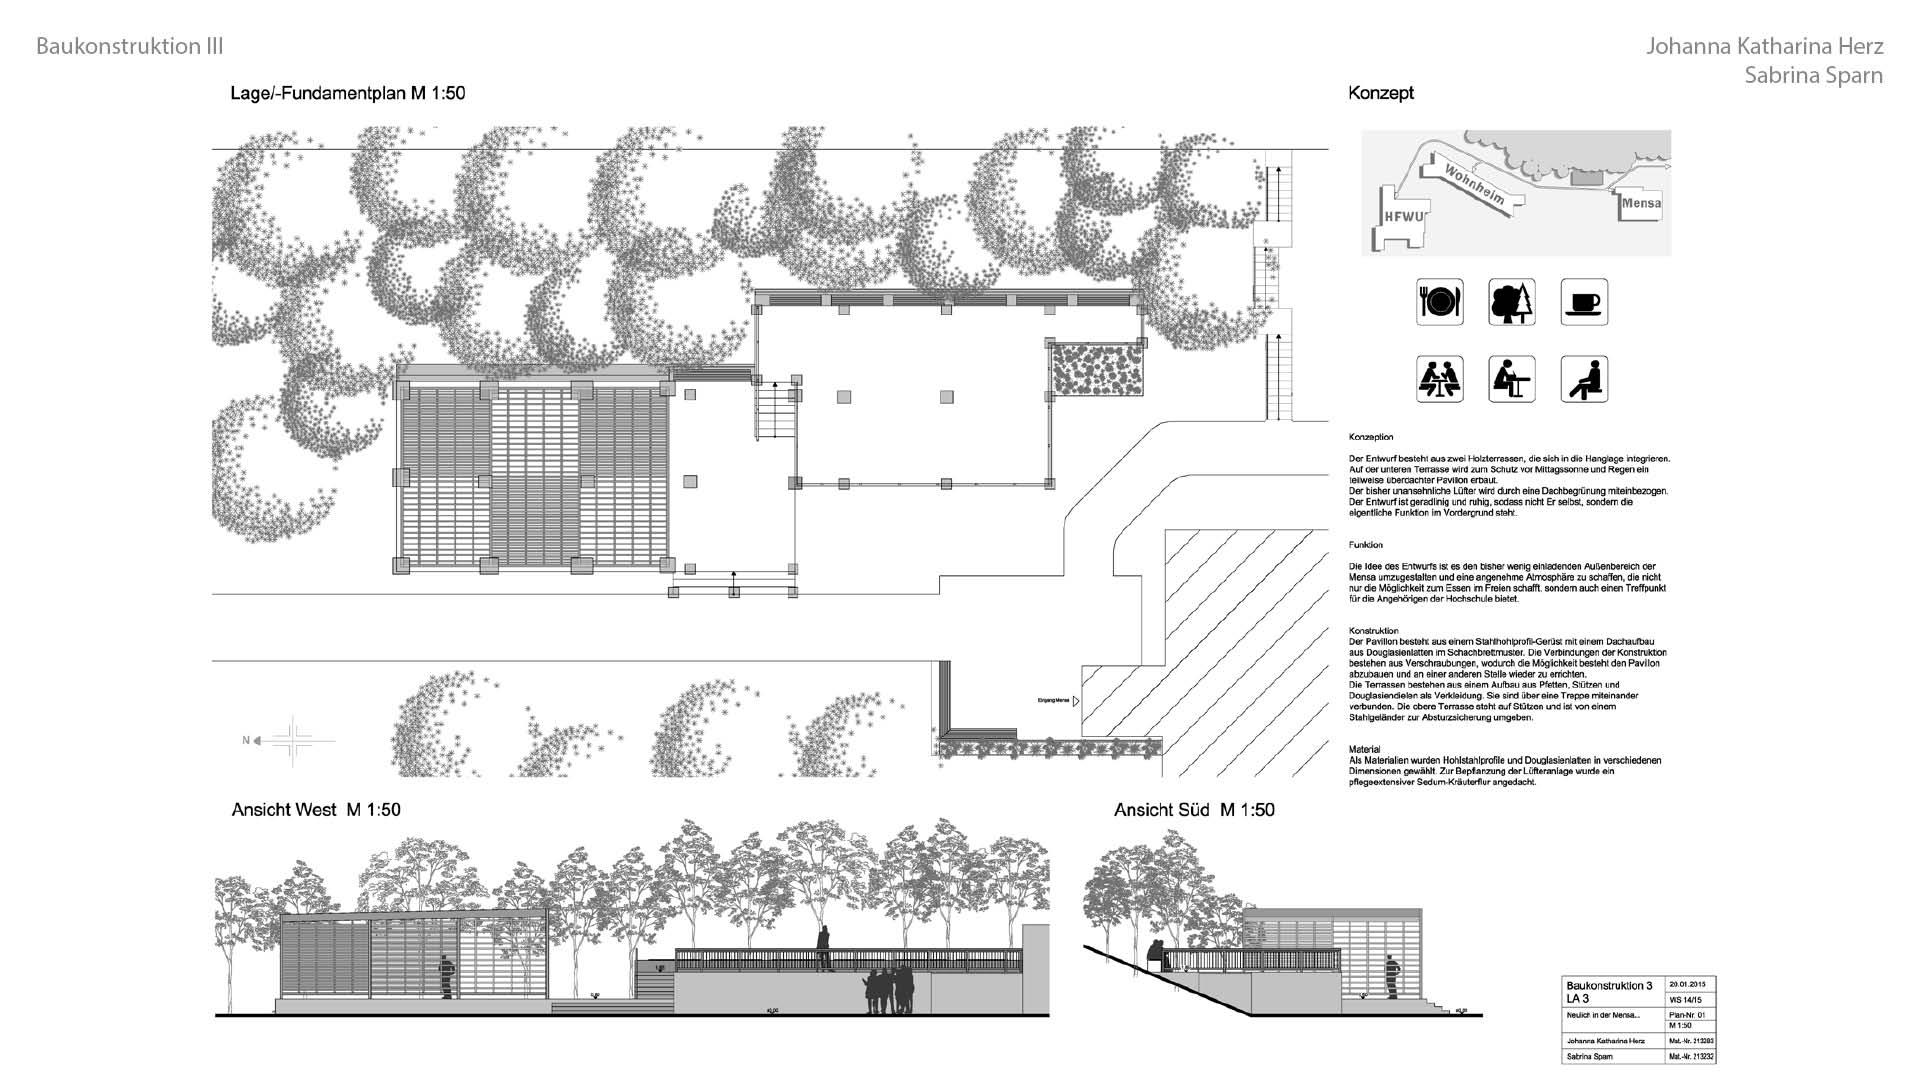 06 14 03 Baukonstruktion III